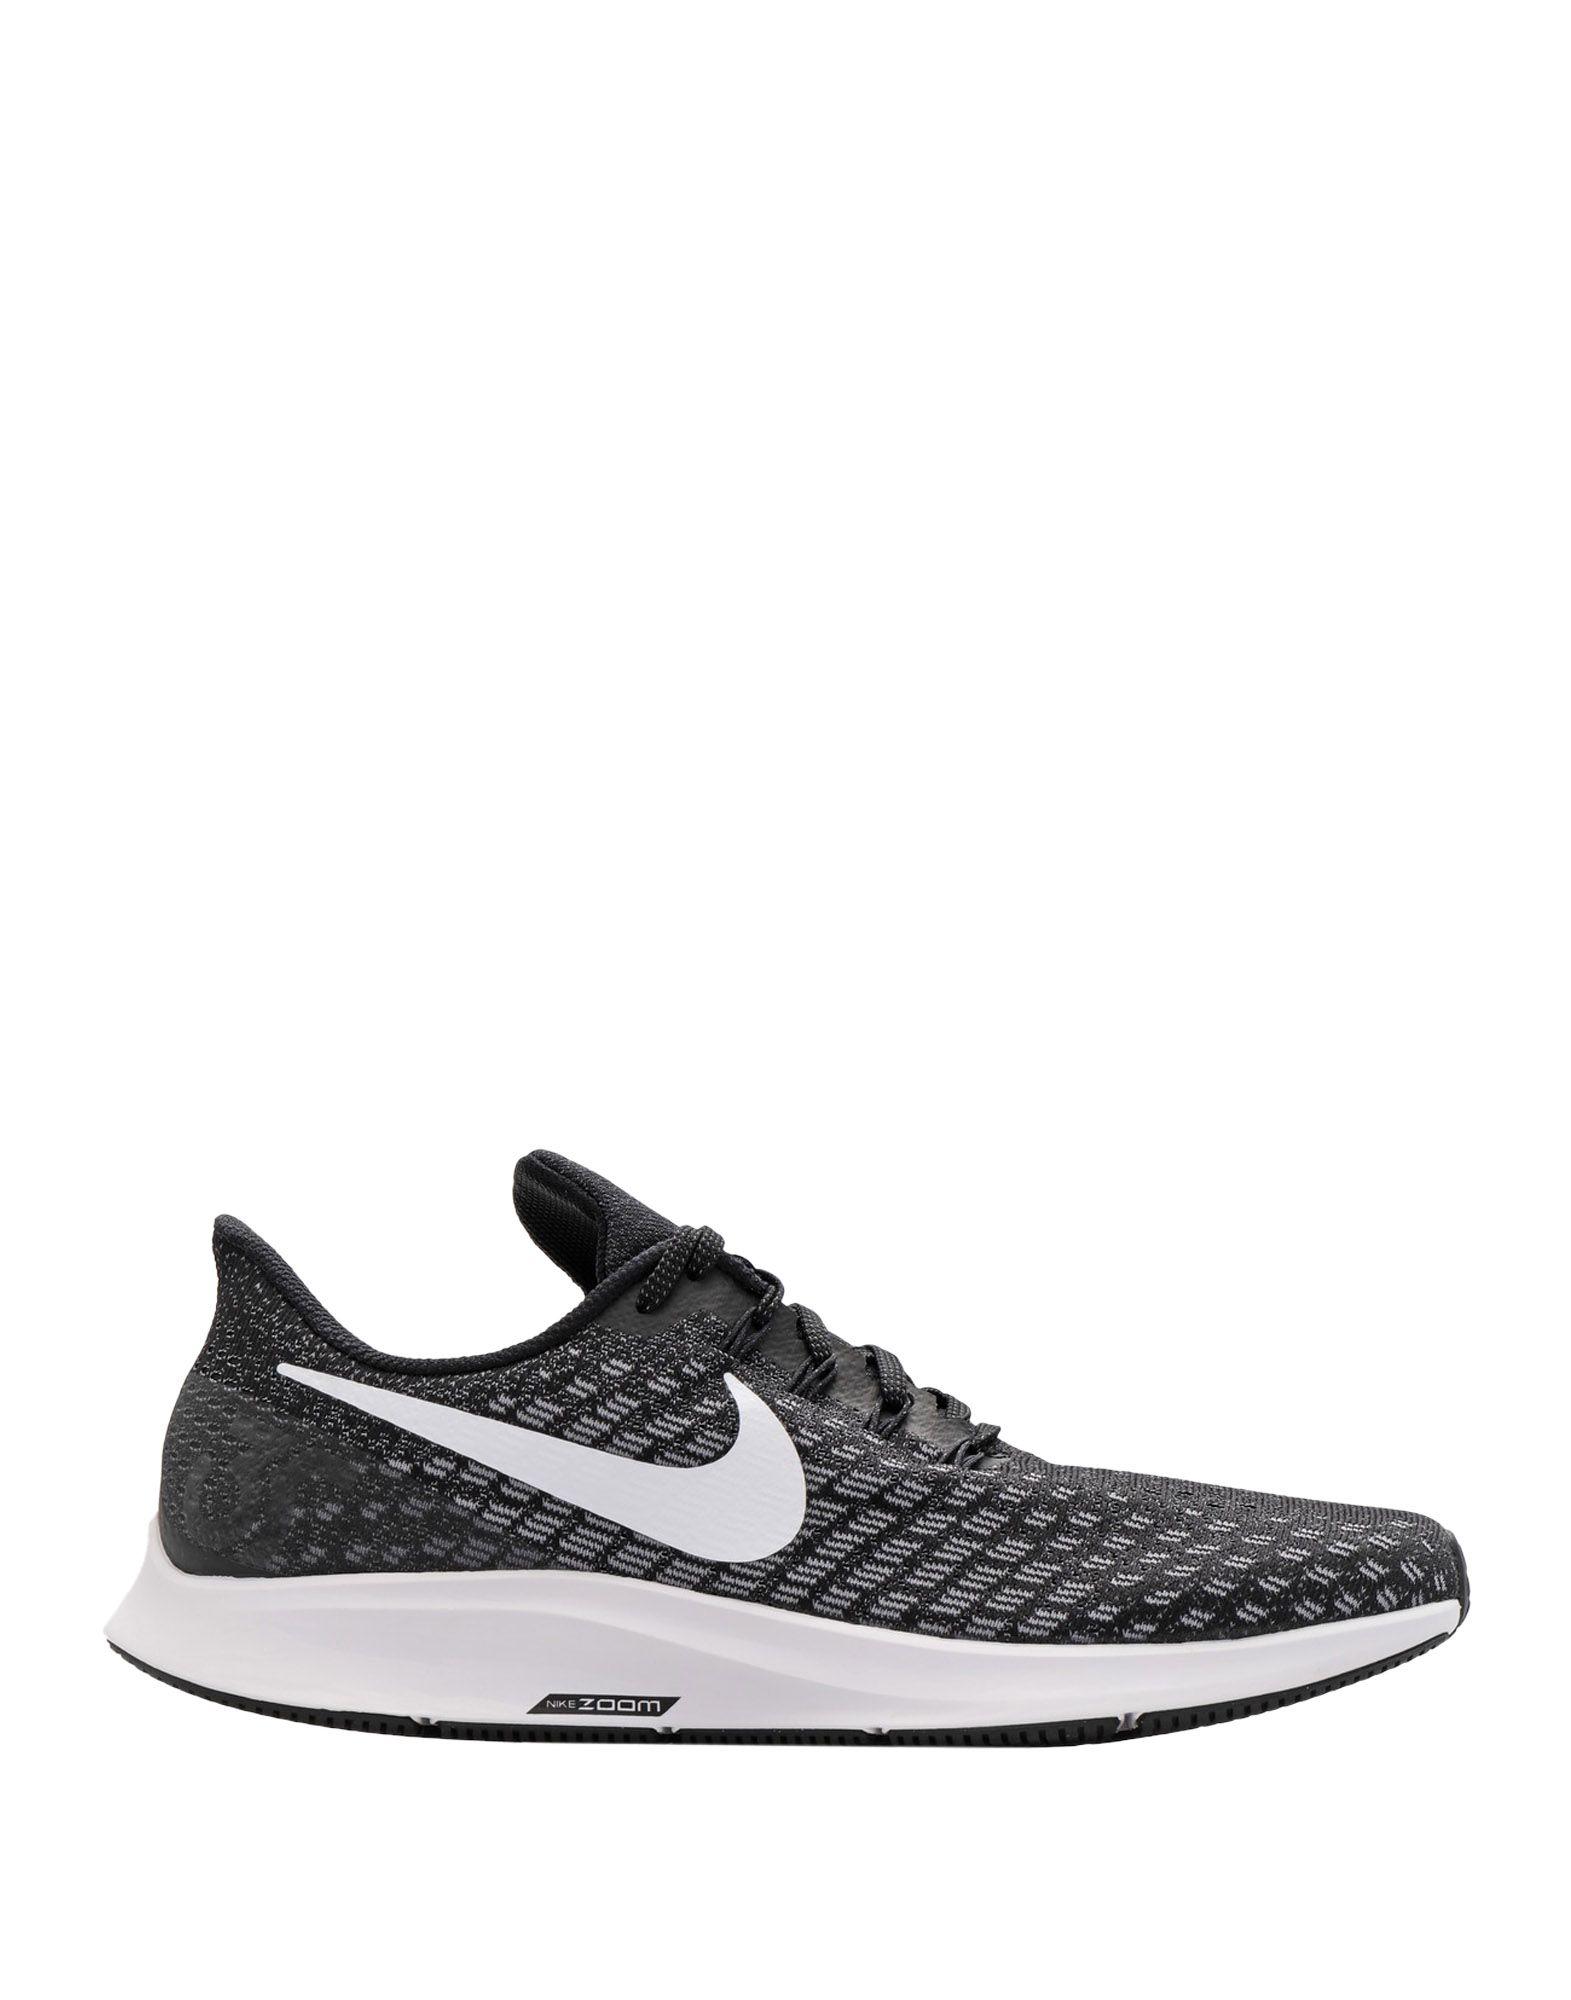 Sneakers Nike  Air Zoom Pegasus 35 - Homme - Sneakers Nike  Noir Meilleur modèle de vente